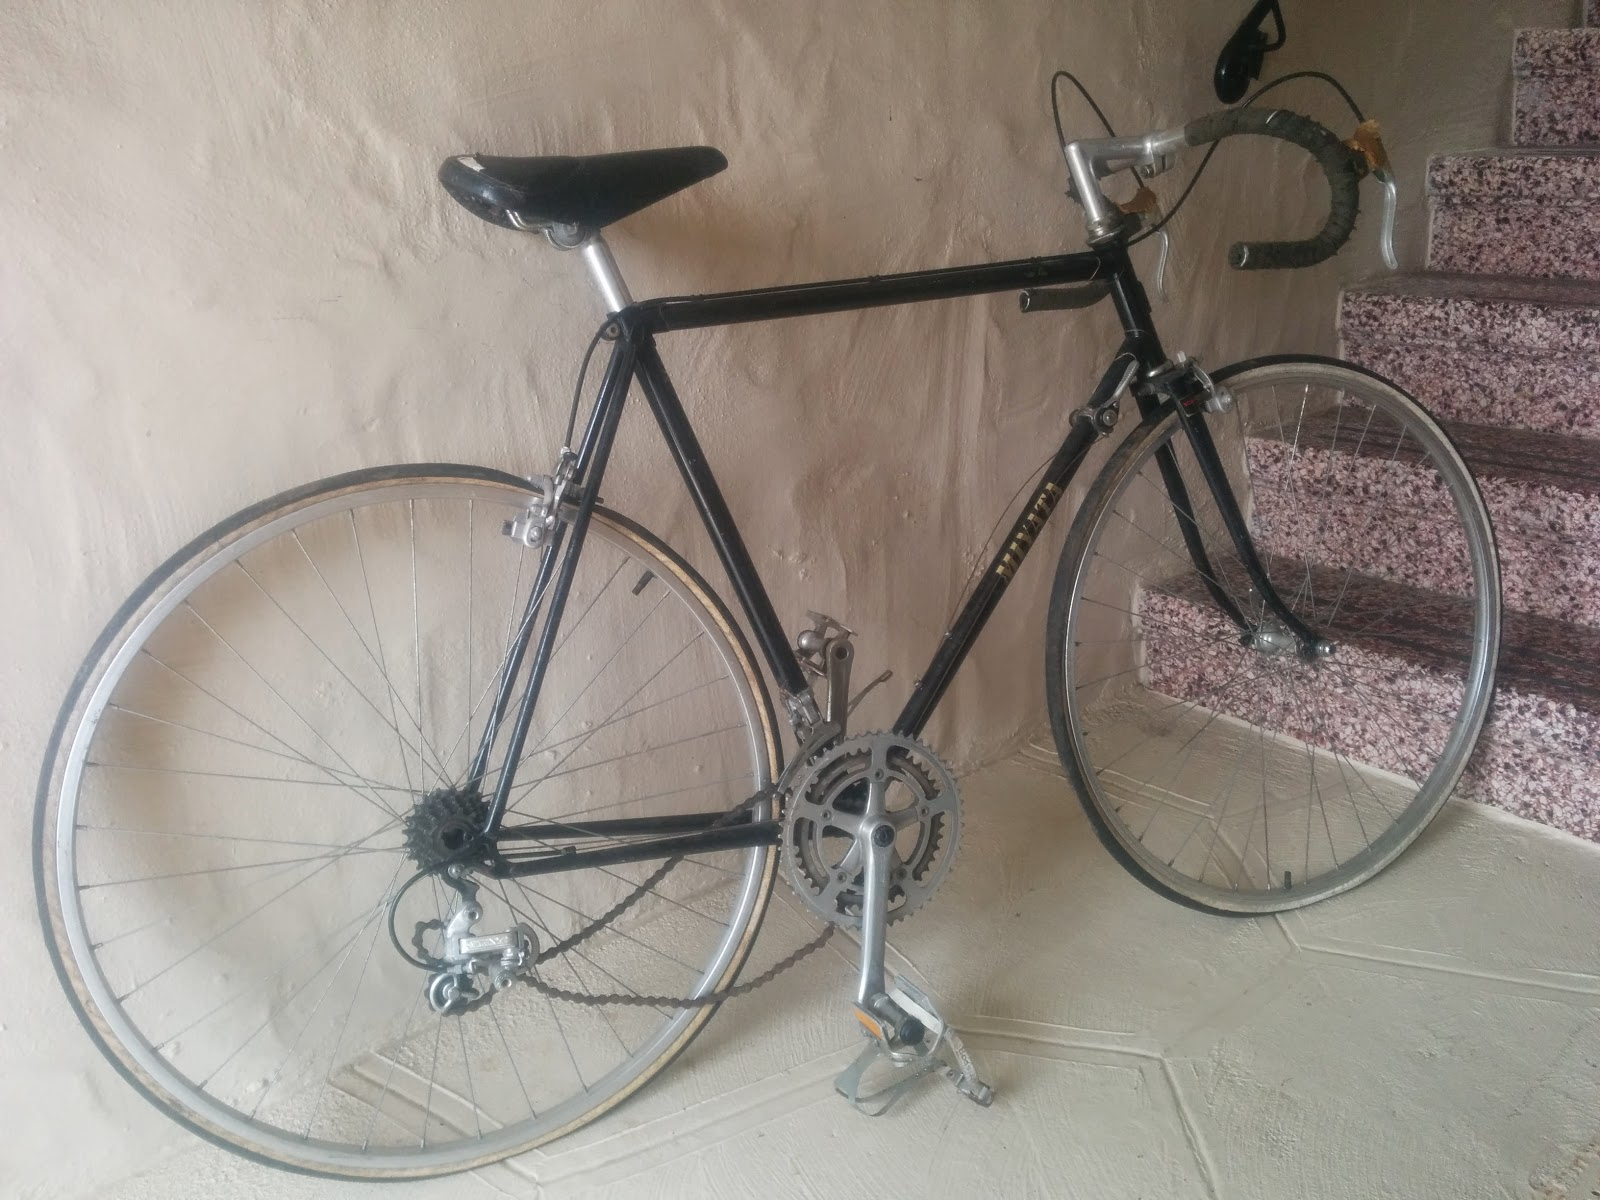 Bought: 1981 Miyata 310 | Bicycle Repair Adventures